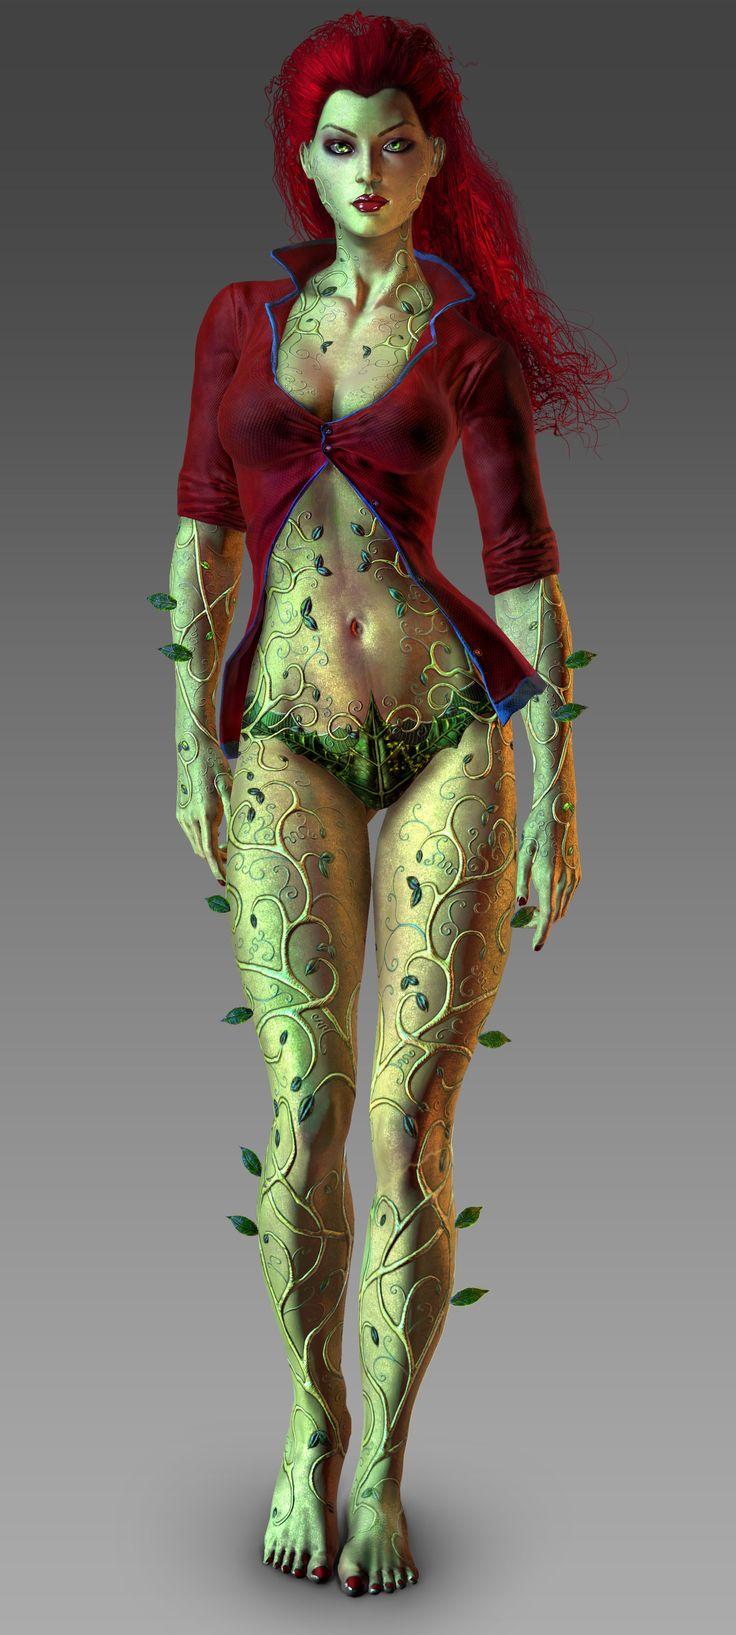 Great costume idea for my best friend. Poison Ivy - Arkham City | For more Villain Love: https://www.pinterest.com/thevioletvixen/villain-love/